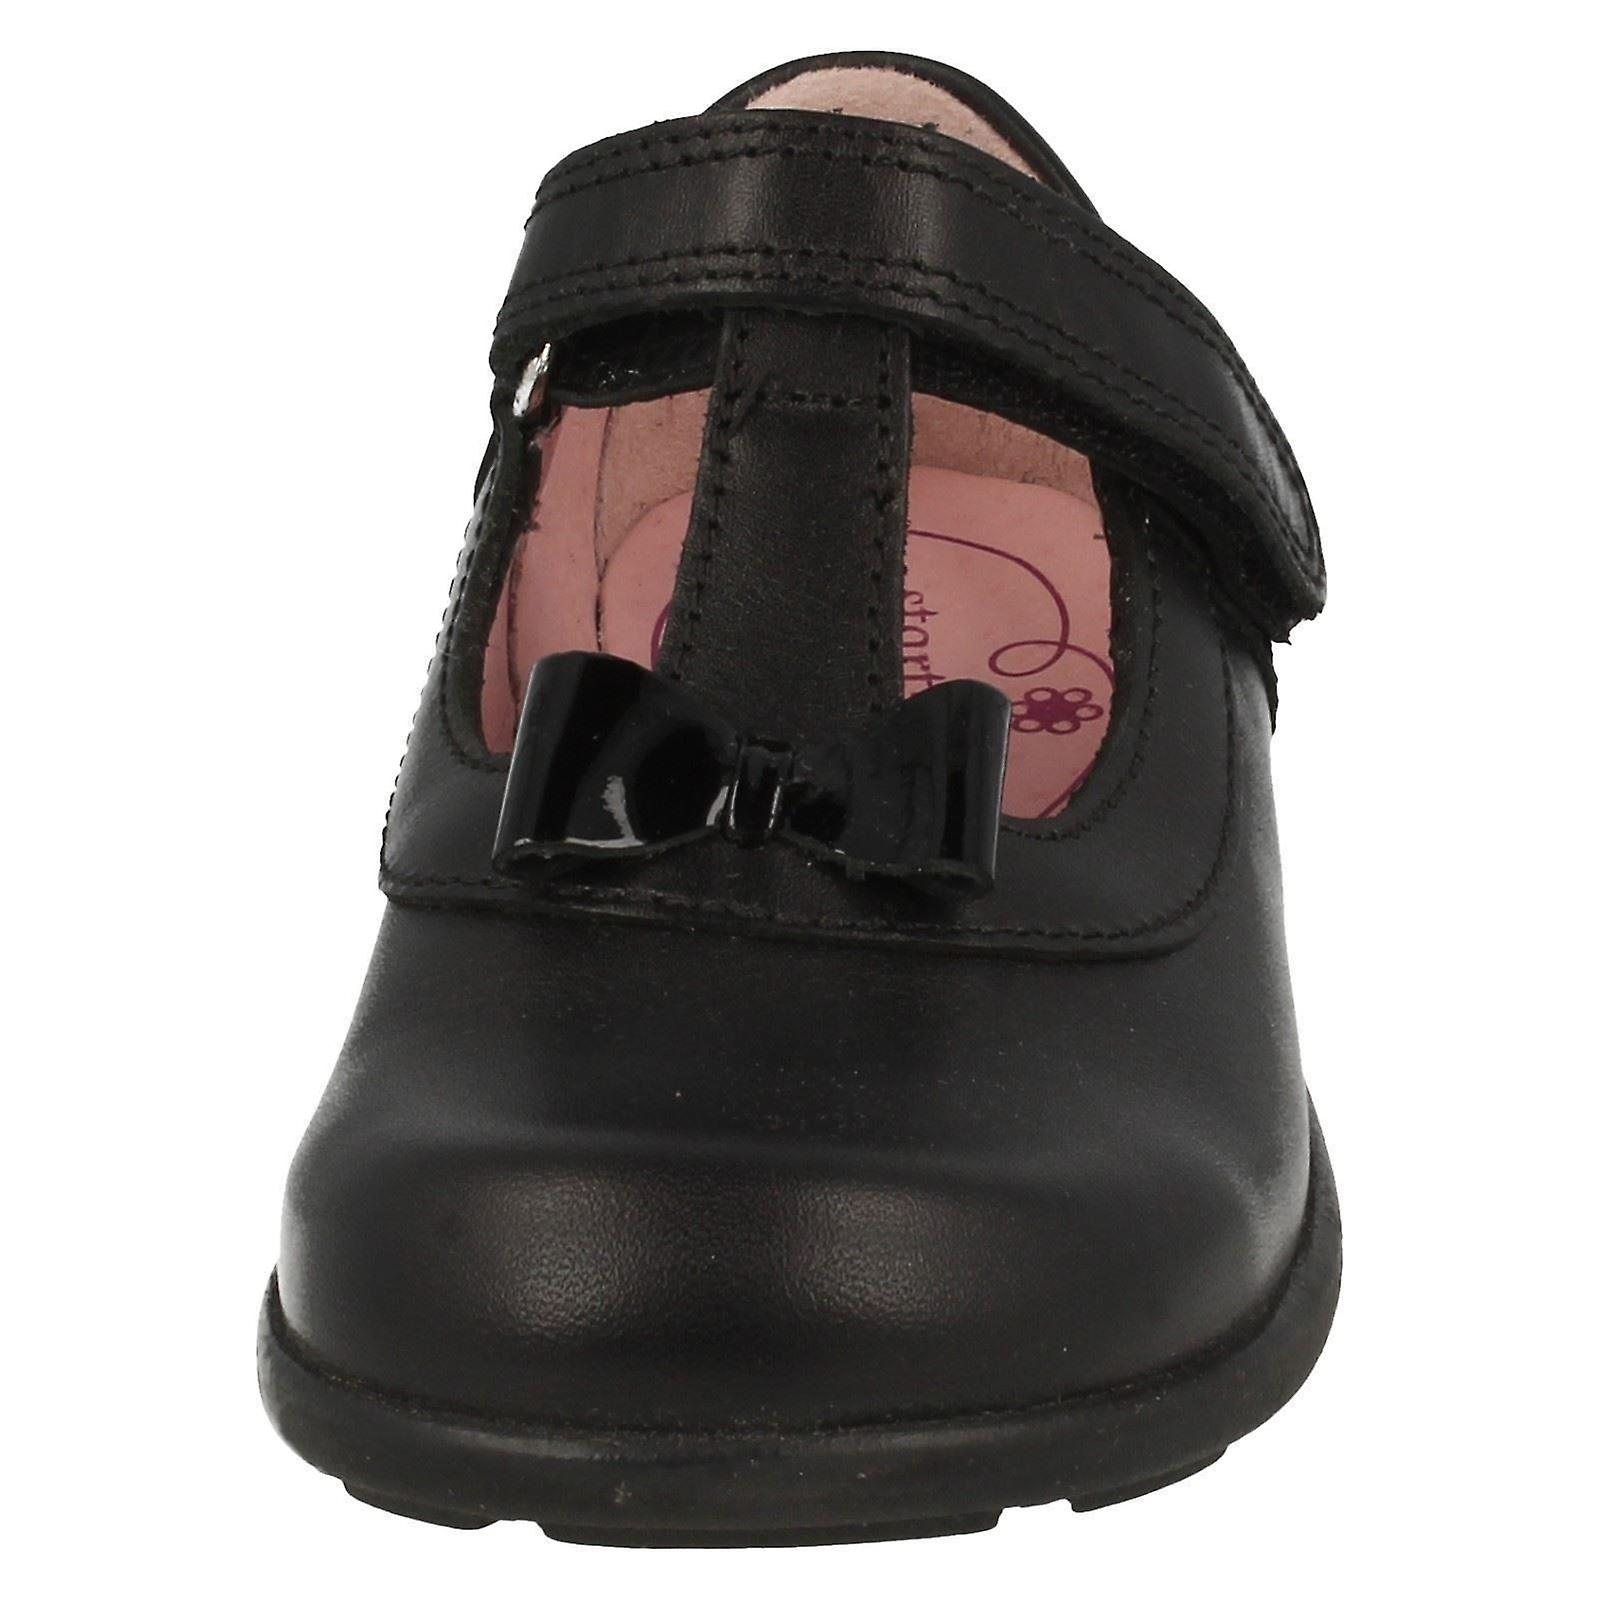 Girls Startrite Formal T-Bar scarpe Alpha Alpha Alpha   Exit    Uomo/Donna Scarpa  2ed3de